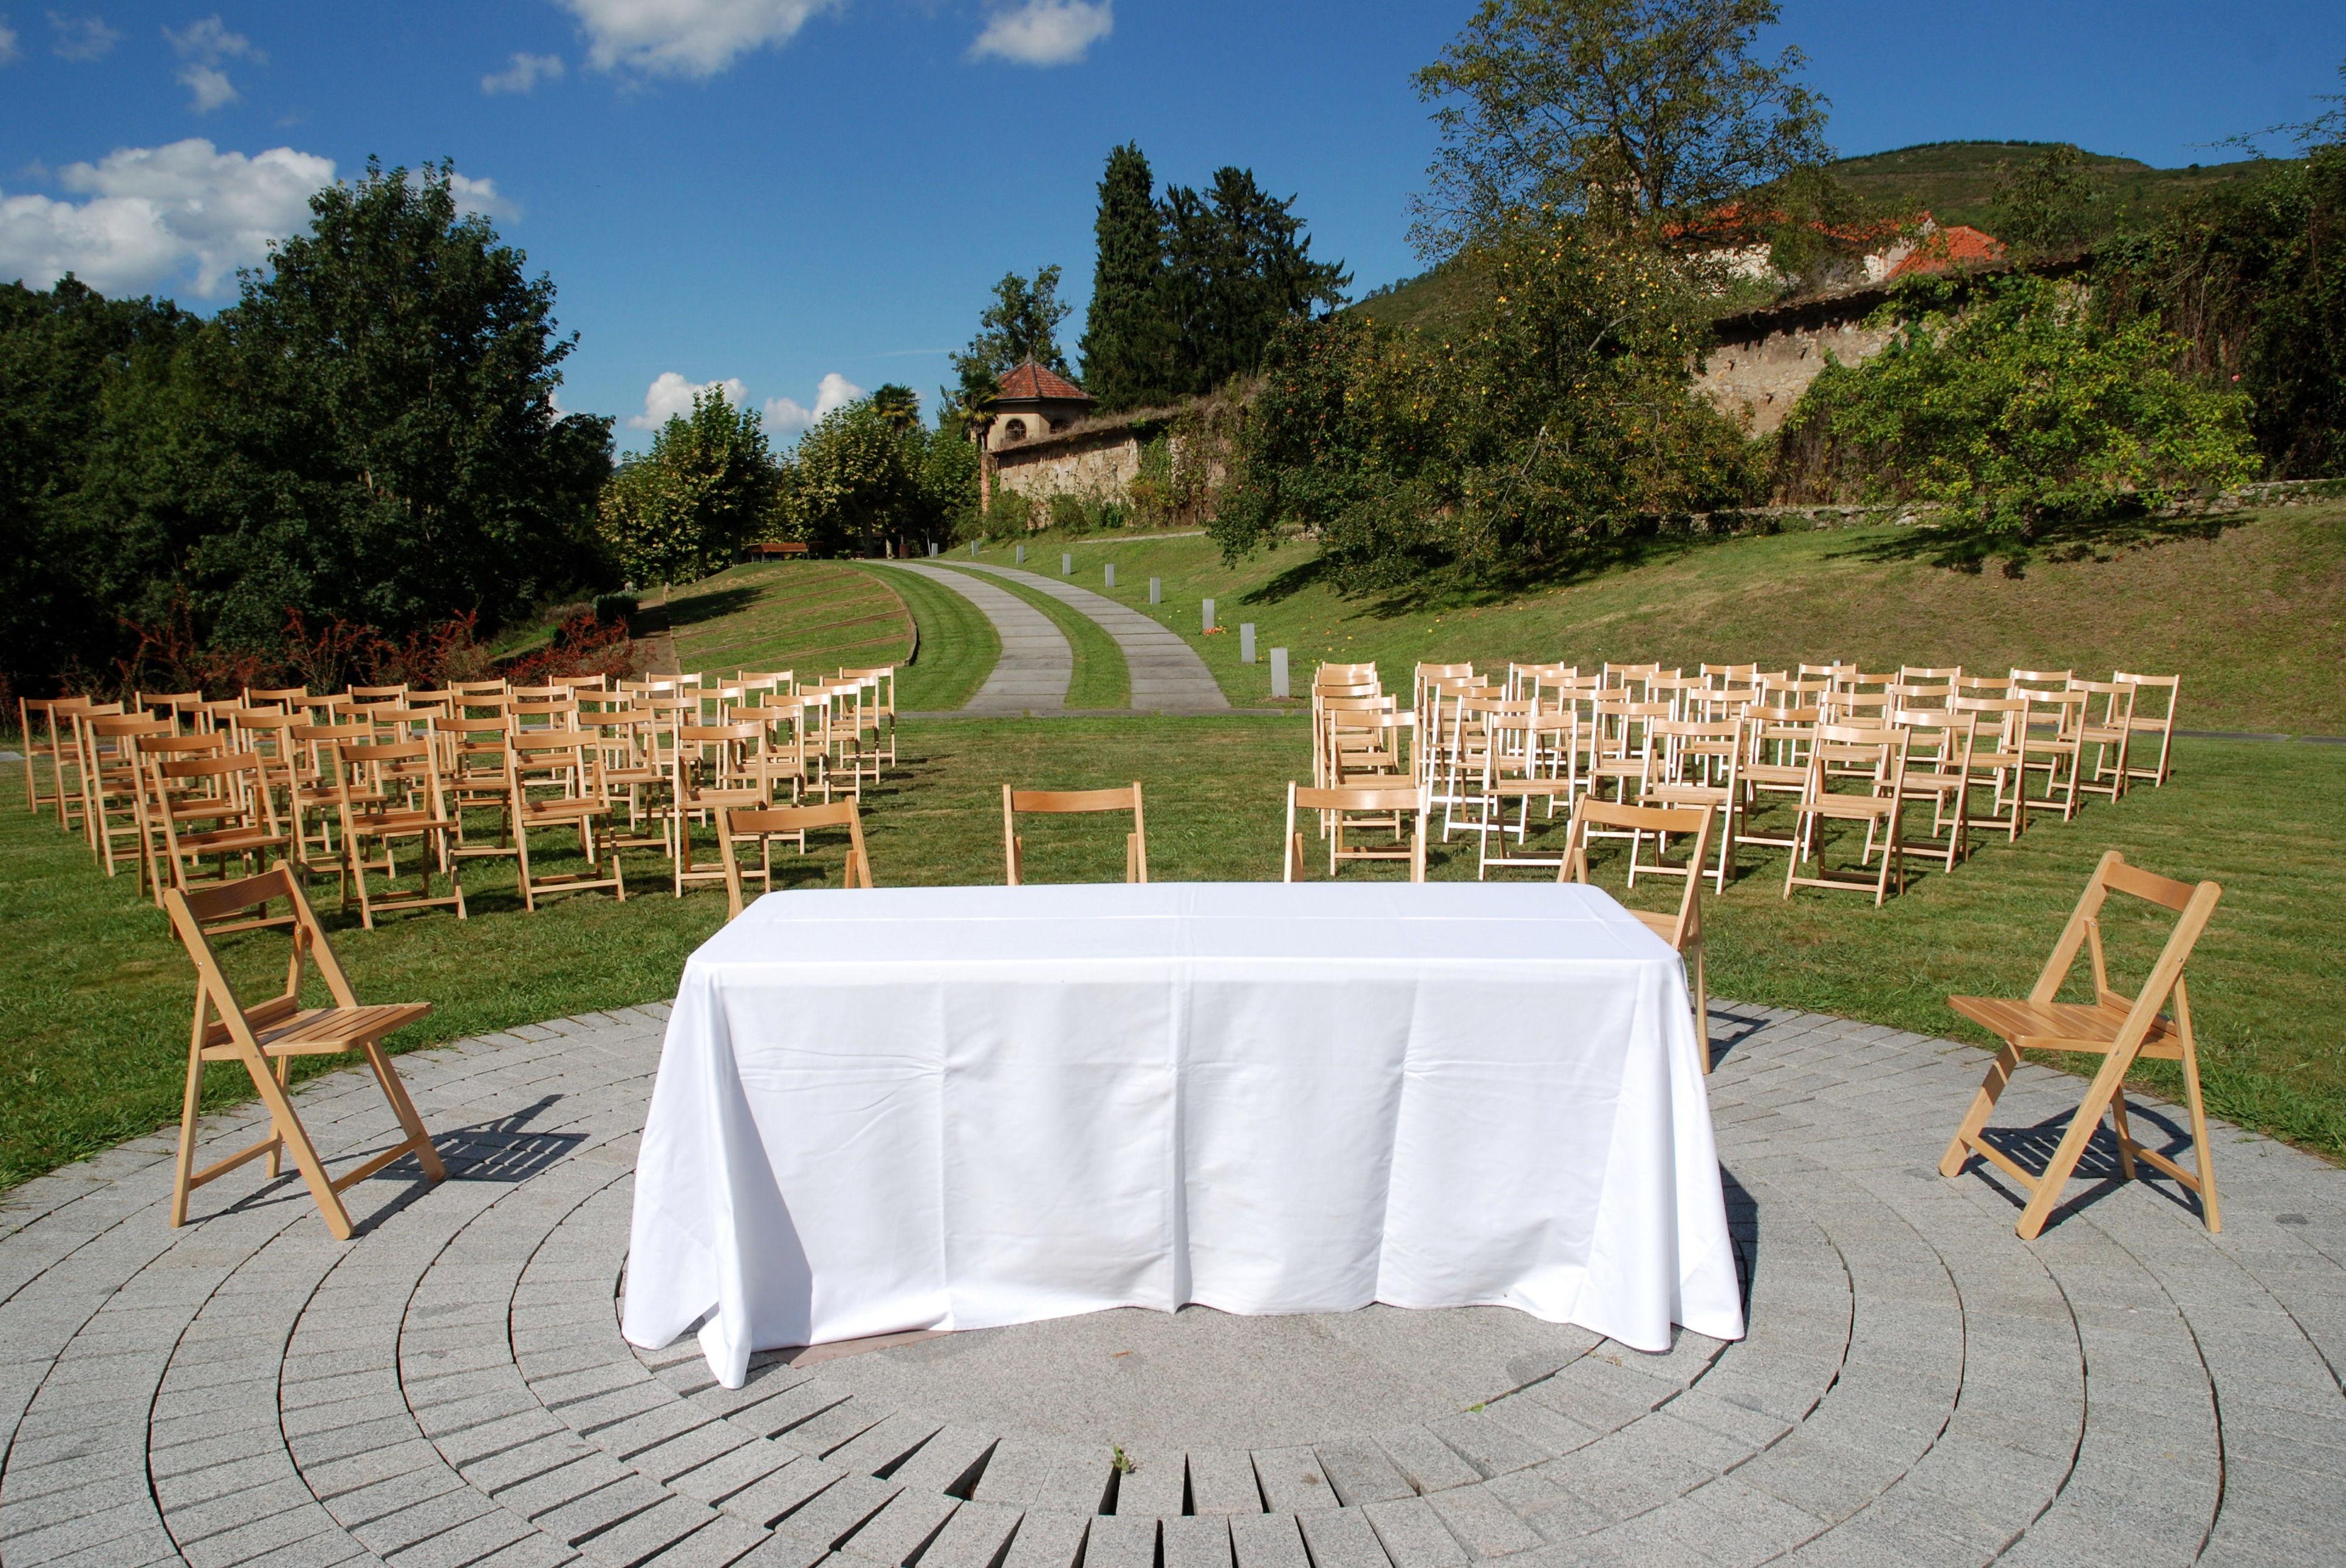 Alquiler de mobiliario para eventos menaje sillas mesas for Sillas para eventos